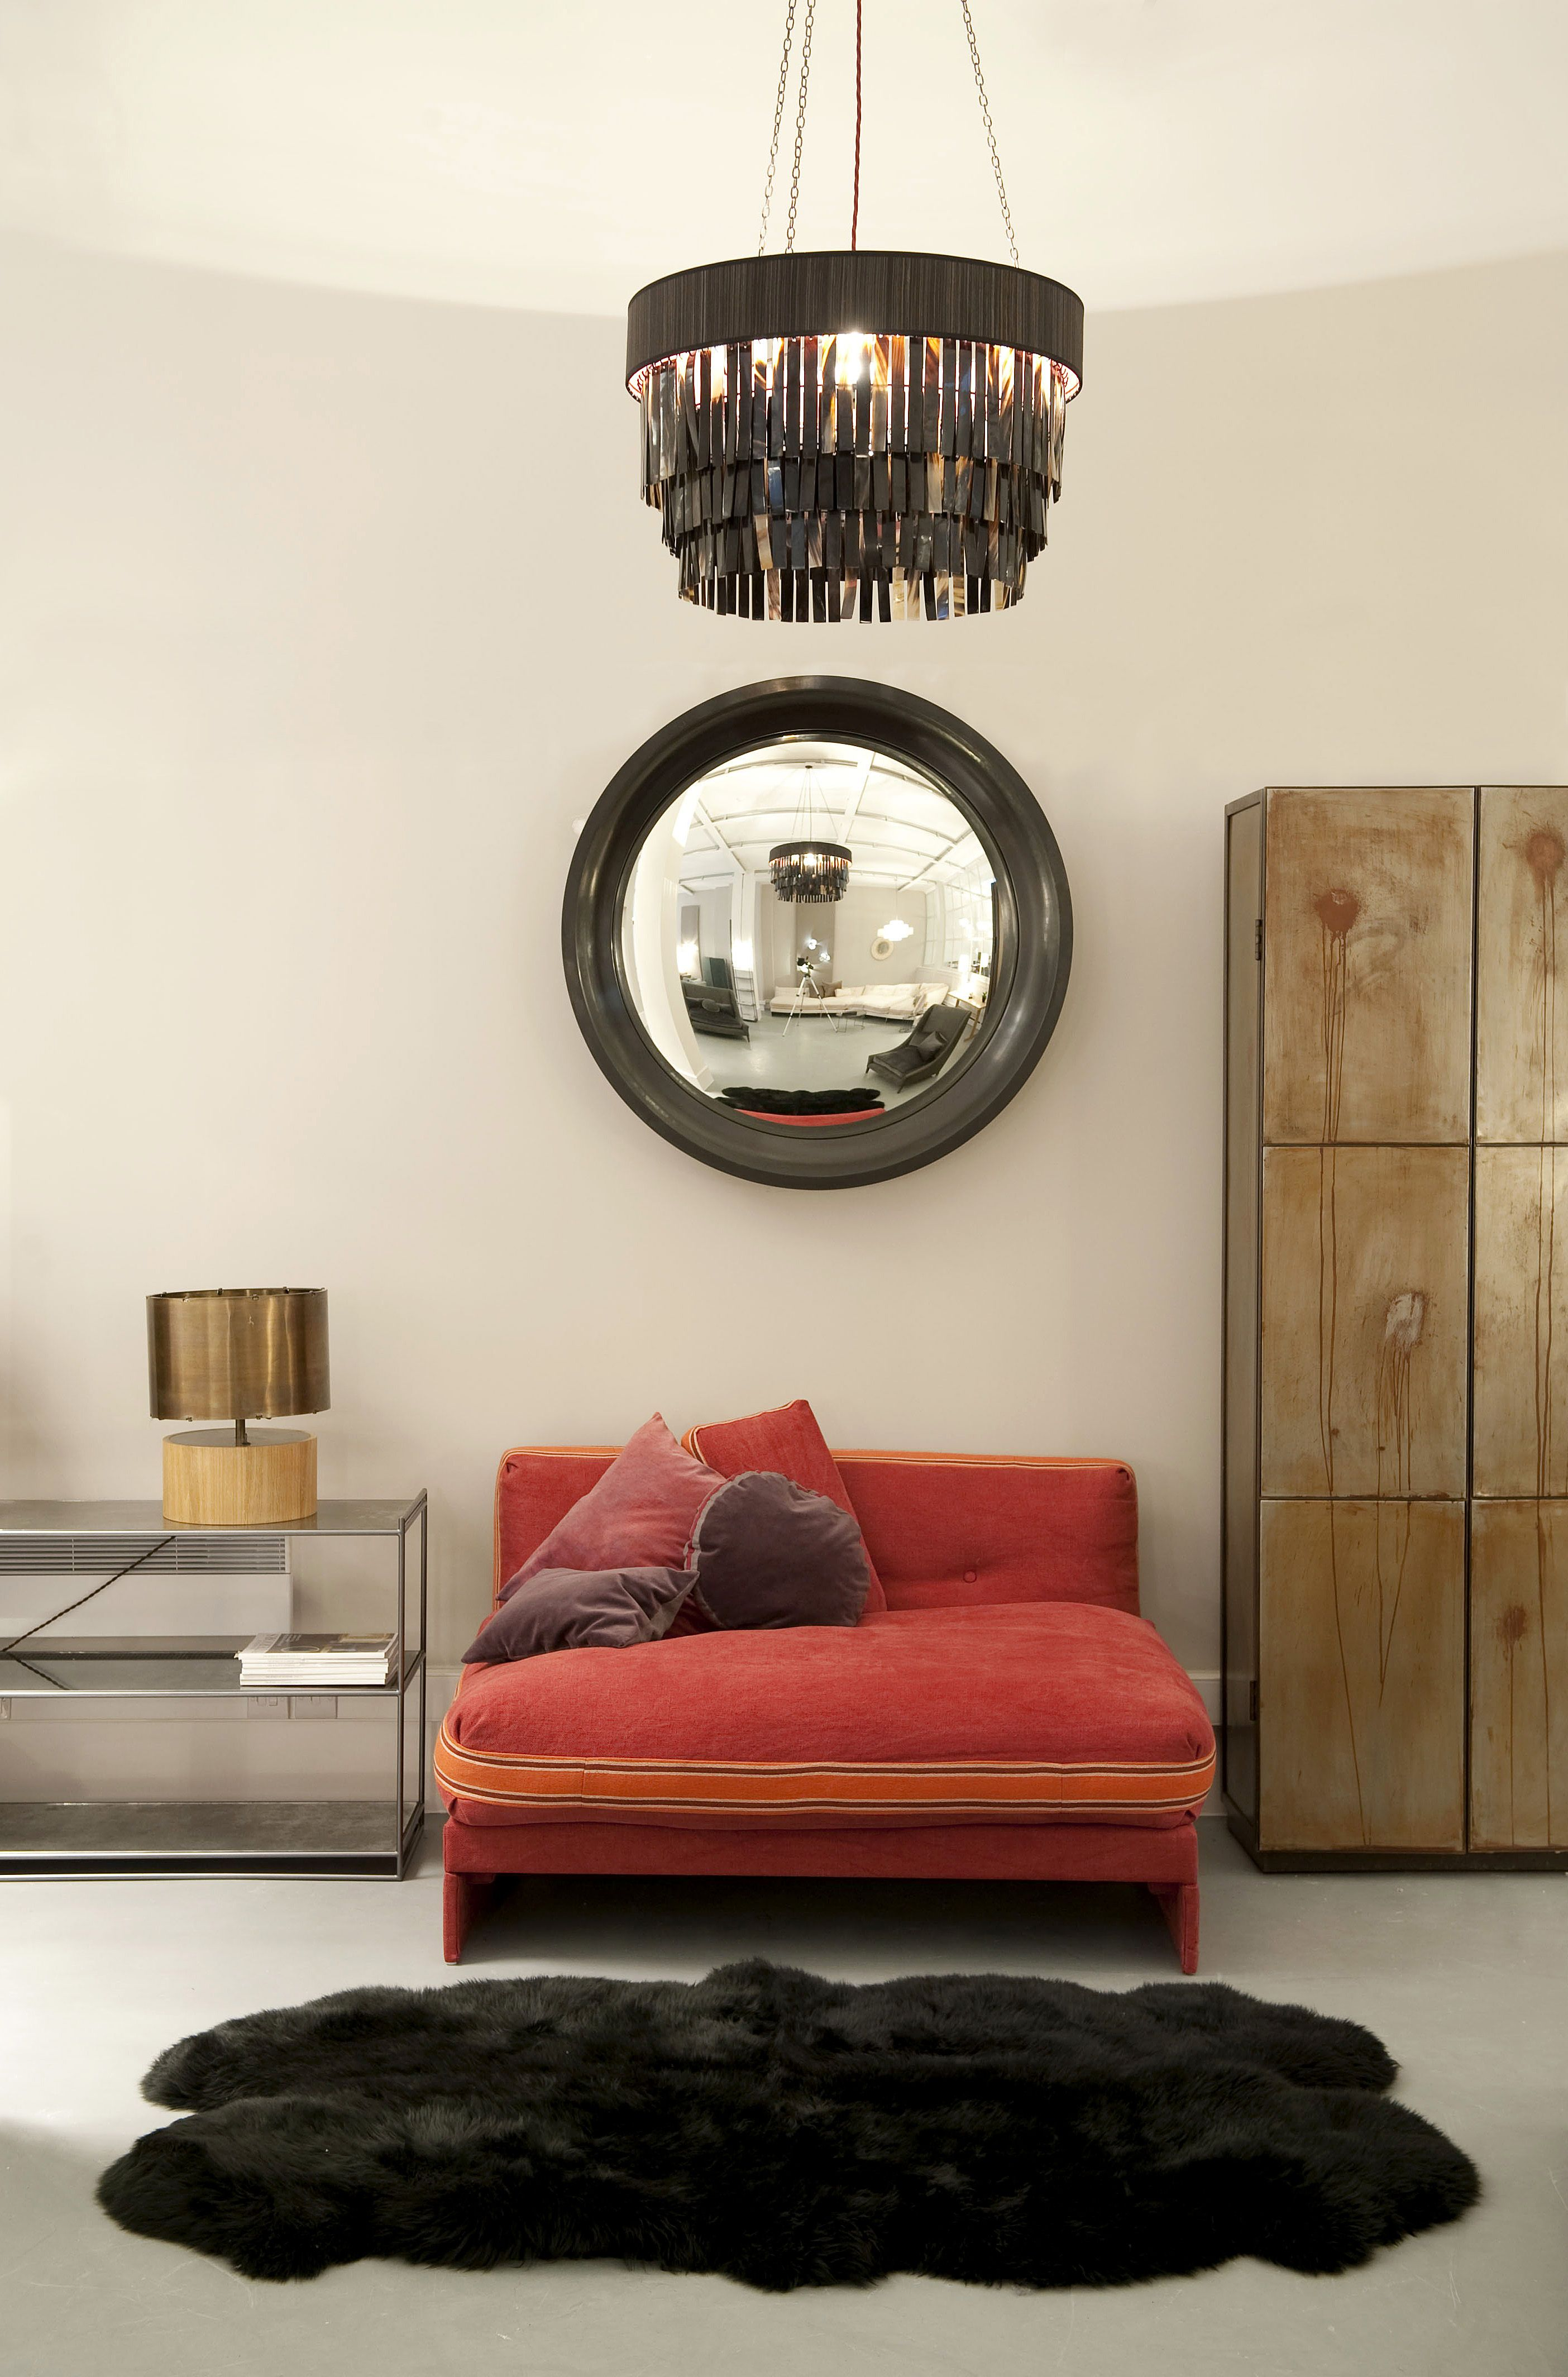 OCHRE at Clerkenwell Design Week 2013 chloe s bedroom sofa